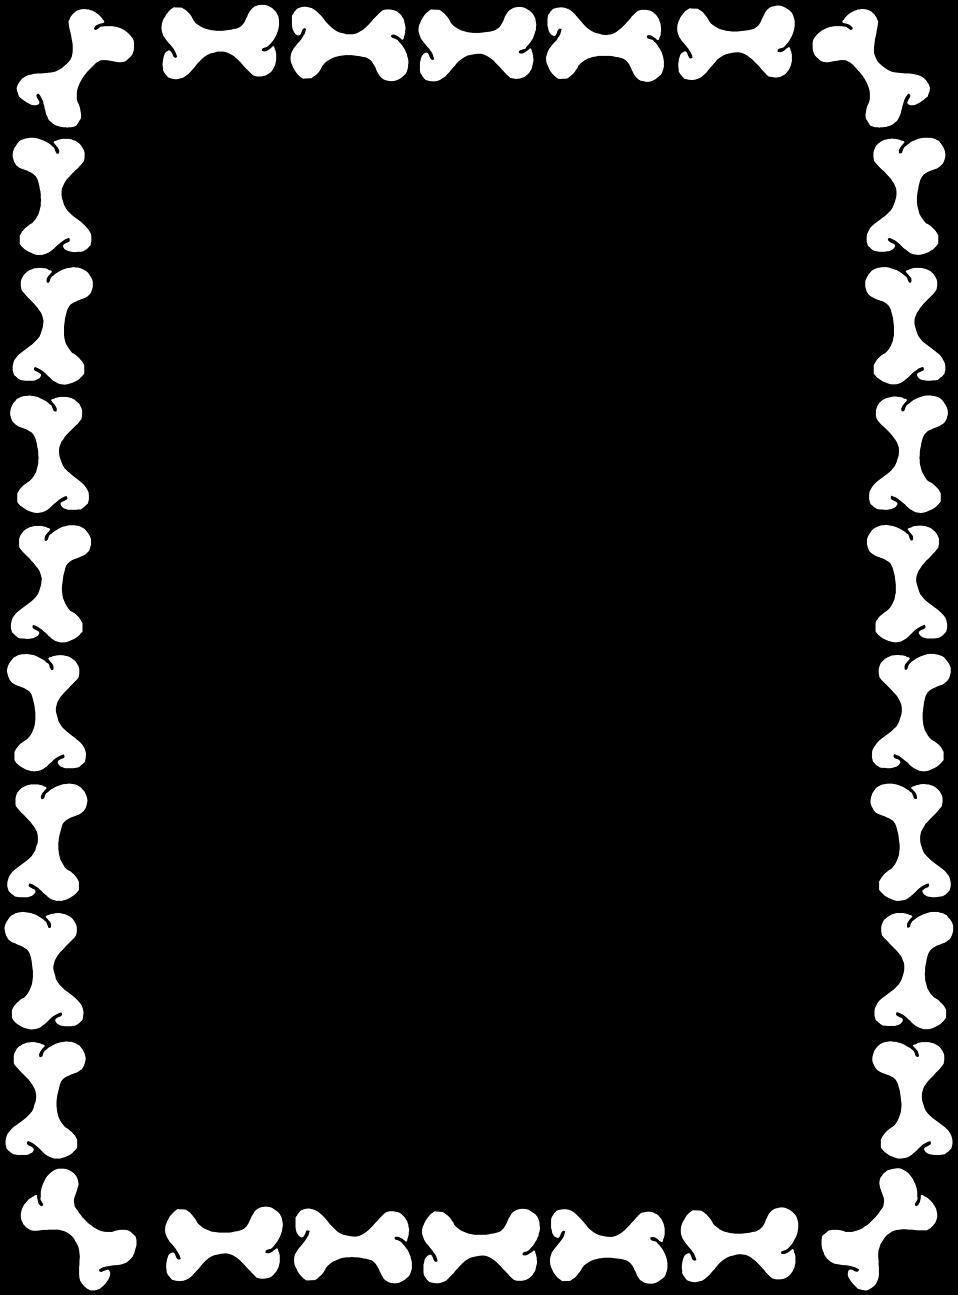 Dog clipart boarder. Hd illustration of blank